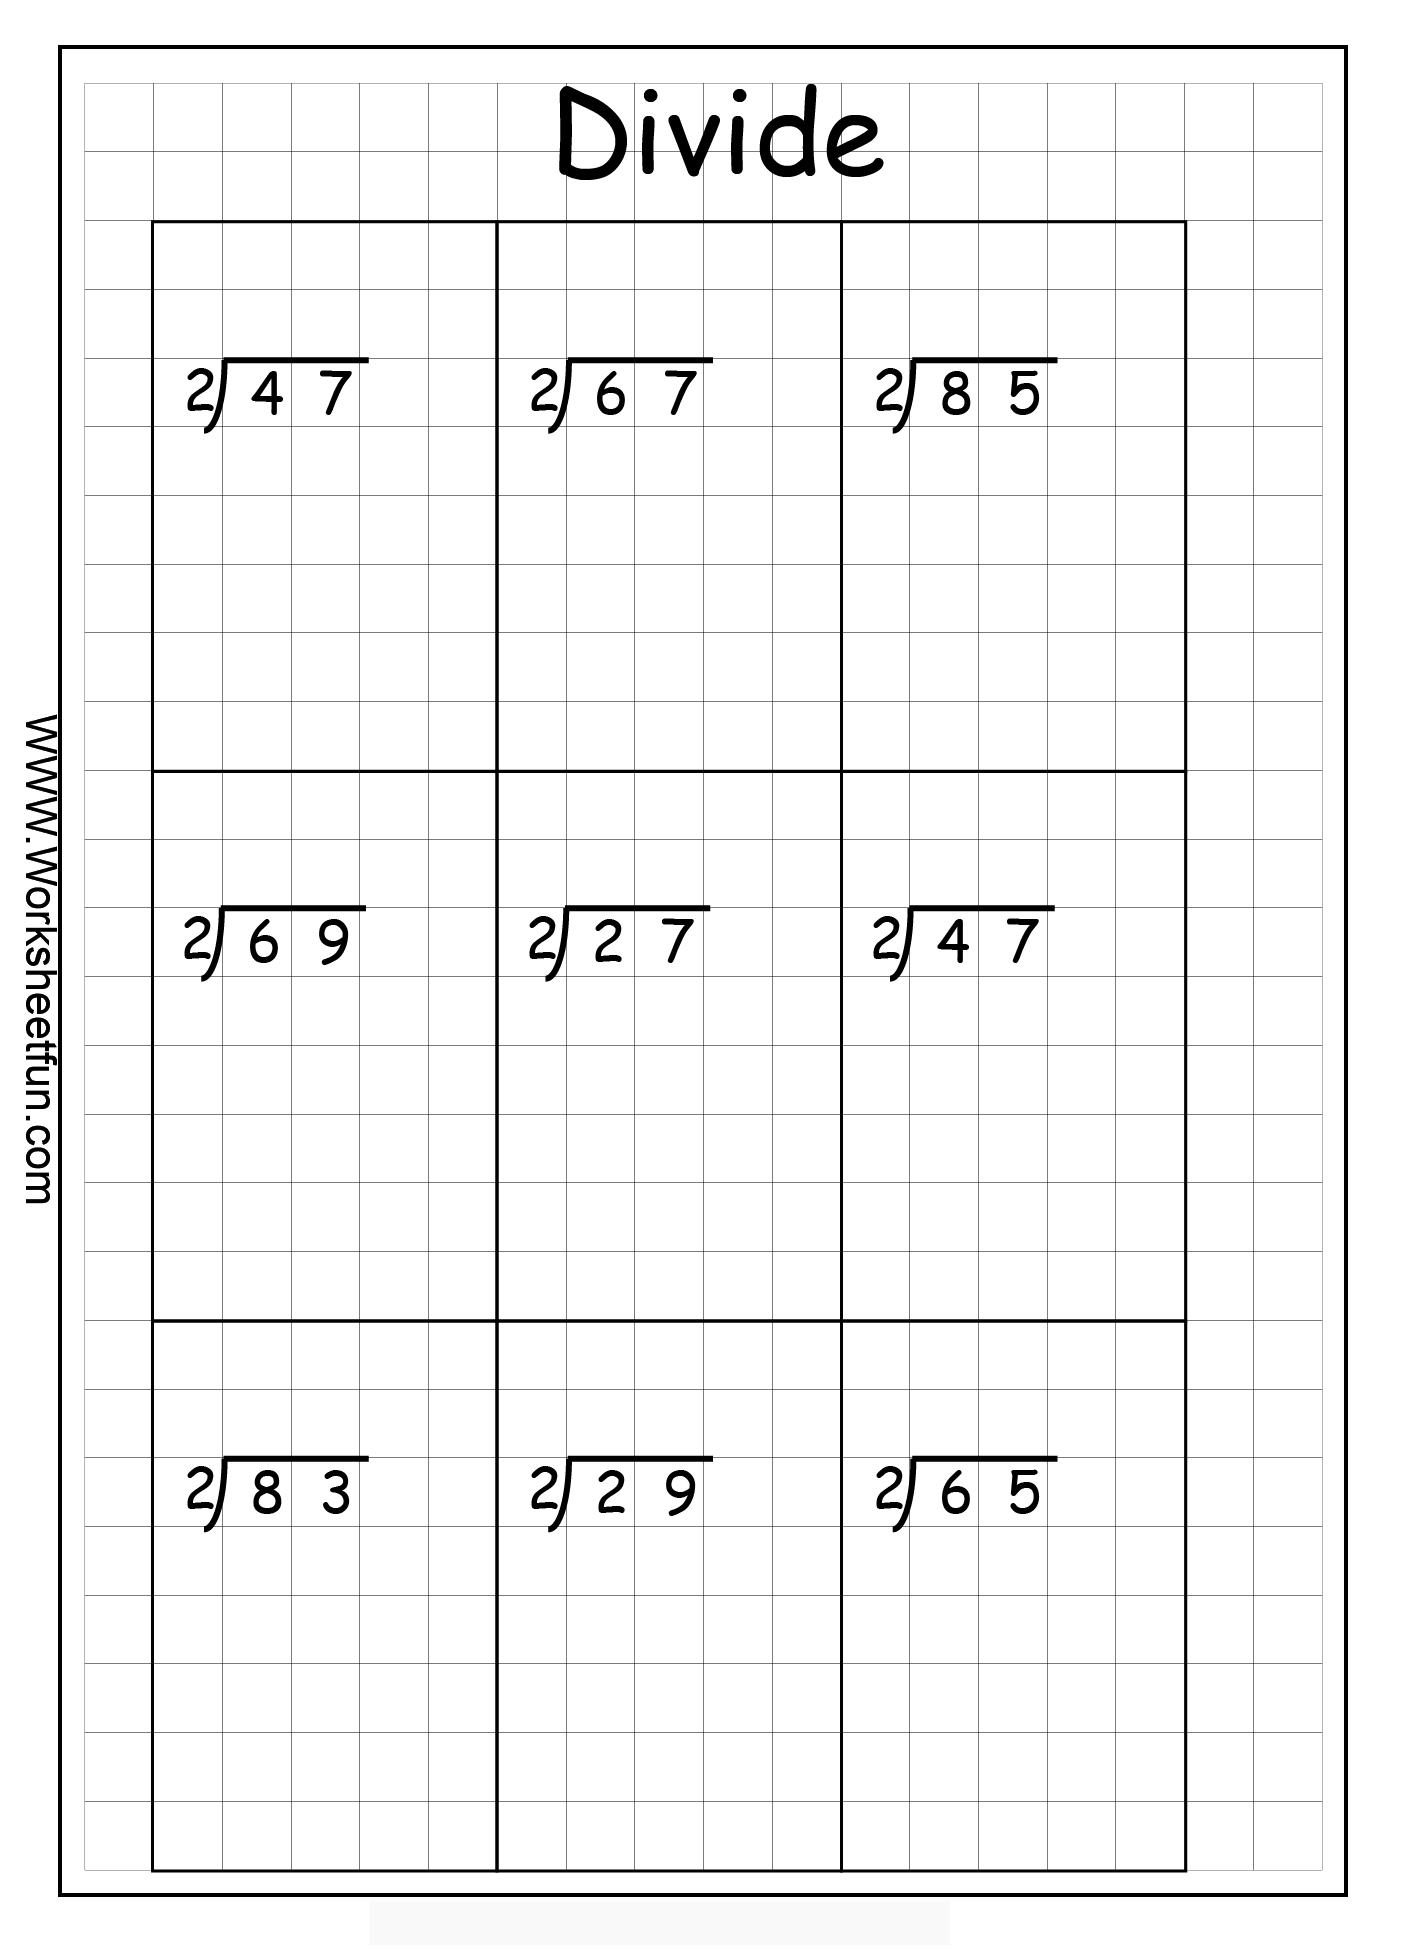 Free Worksheet Fun Division Worksheets 17 best images about division worksheets on pinterest to work math and remainders